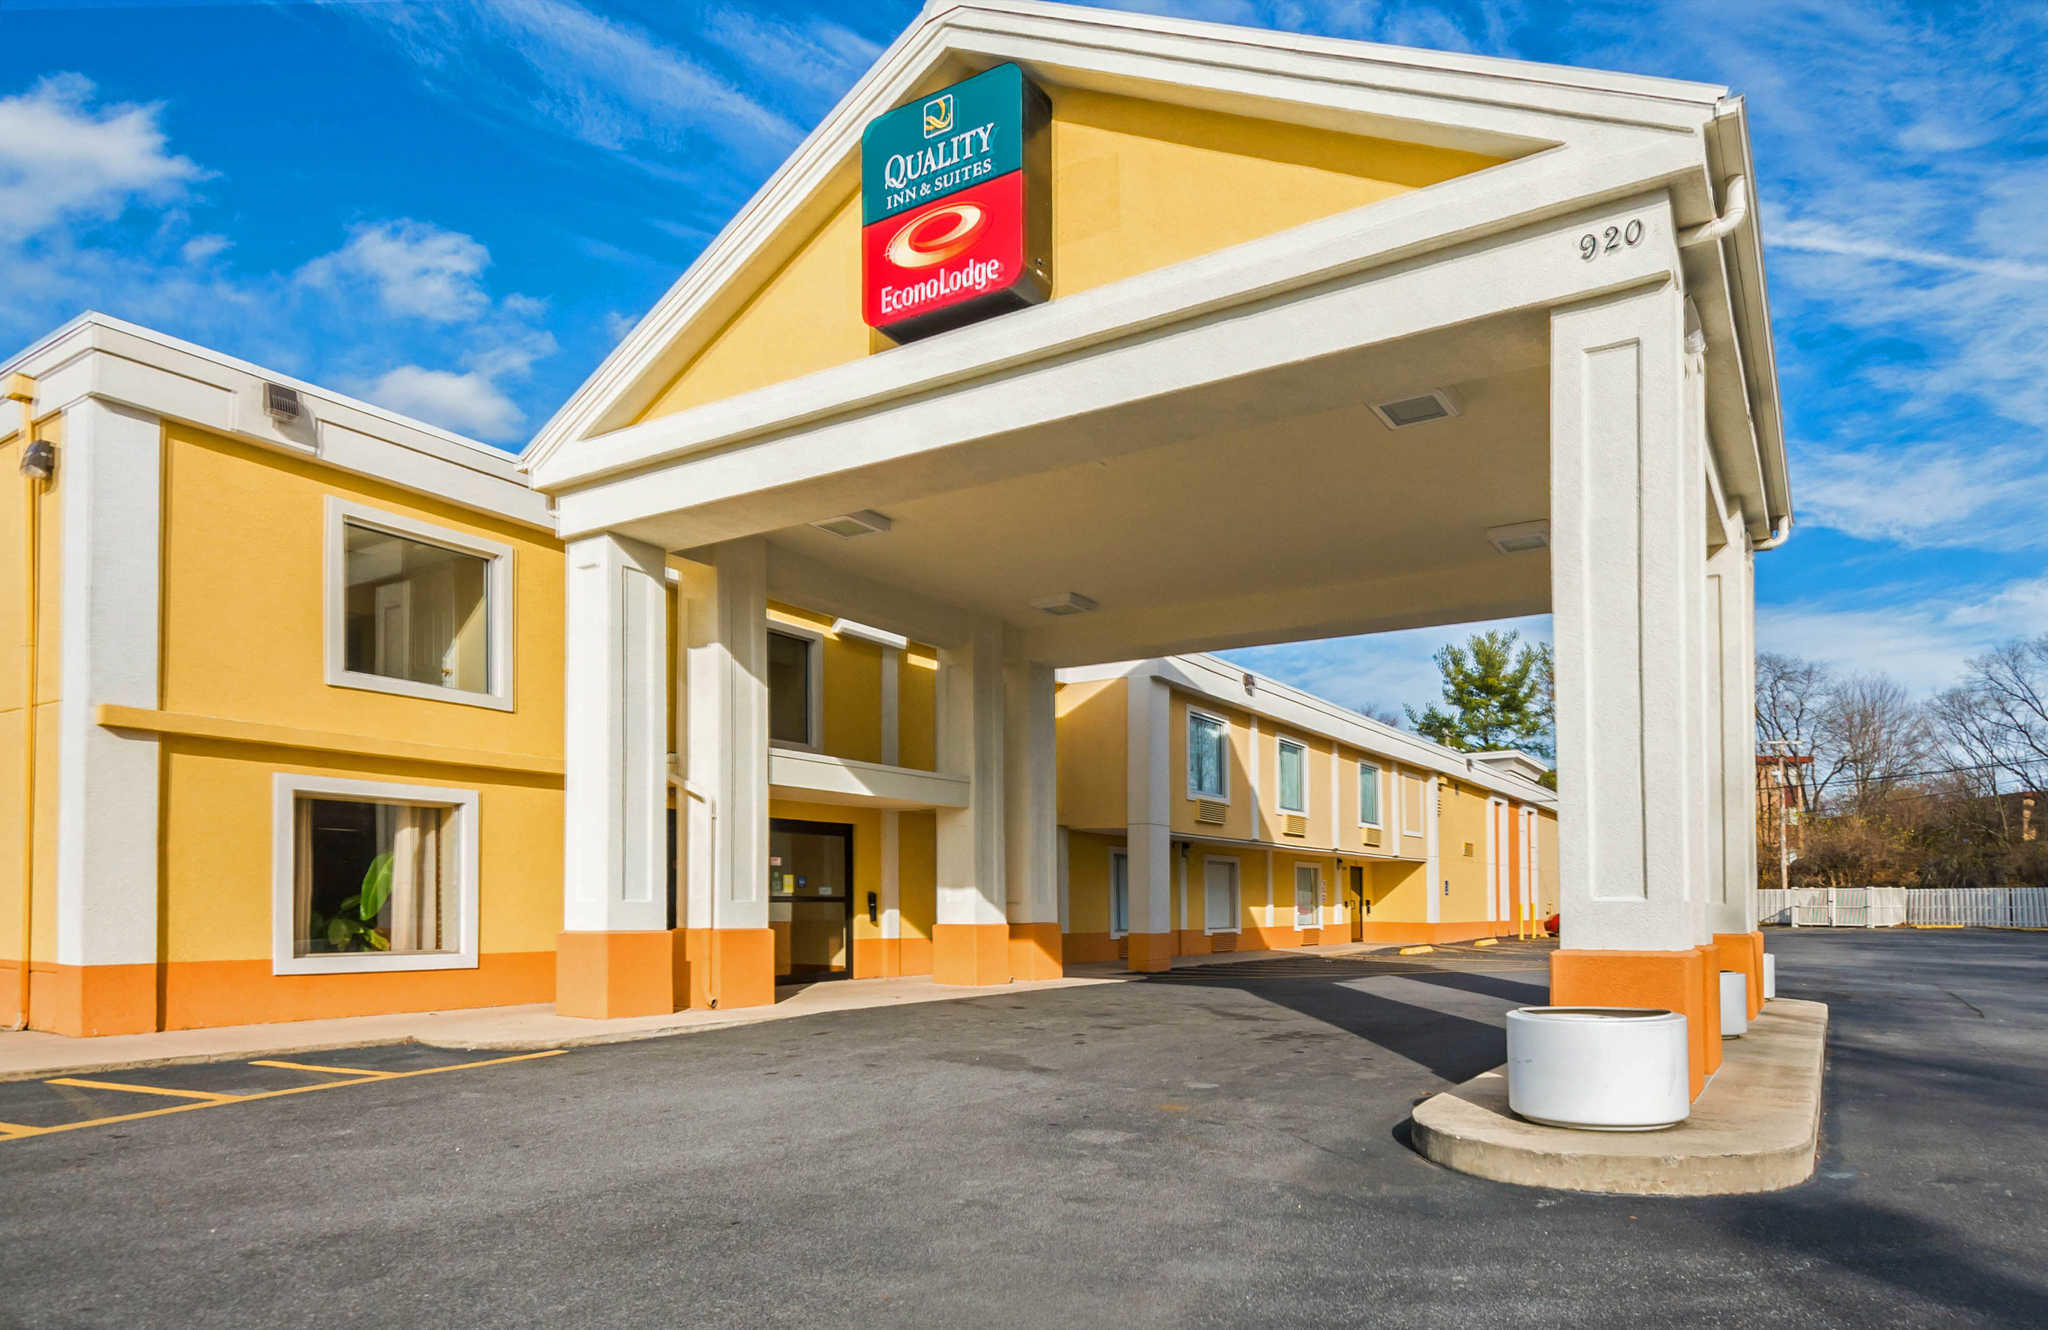 Hotels In Hagerstown Md Near Interstate